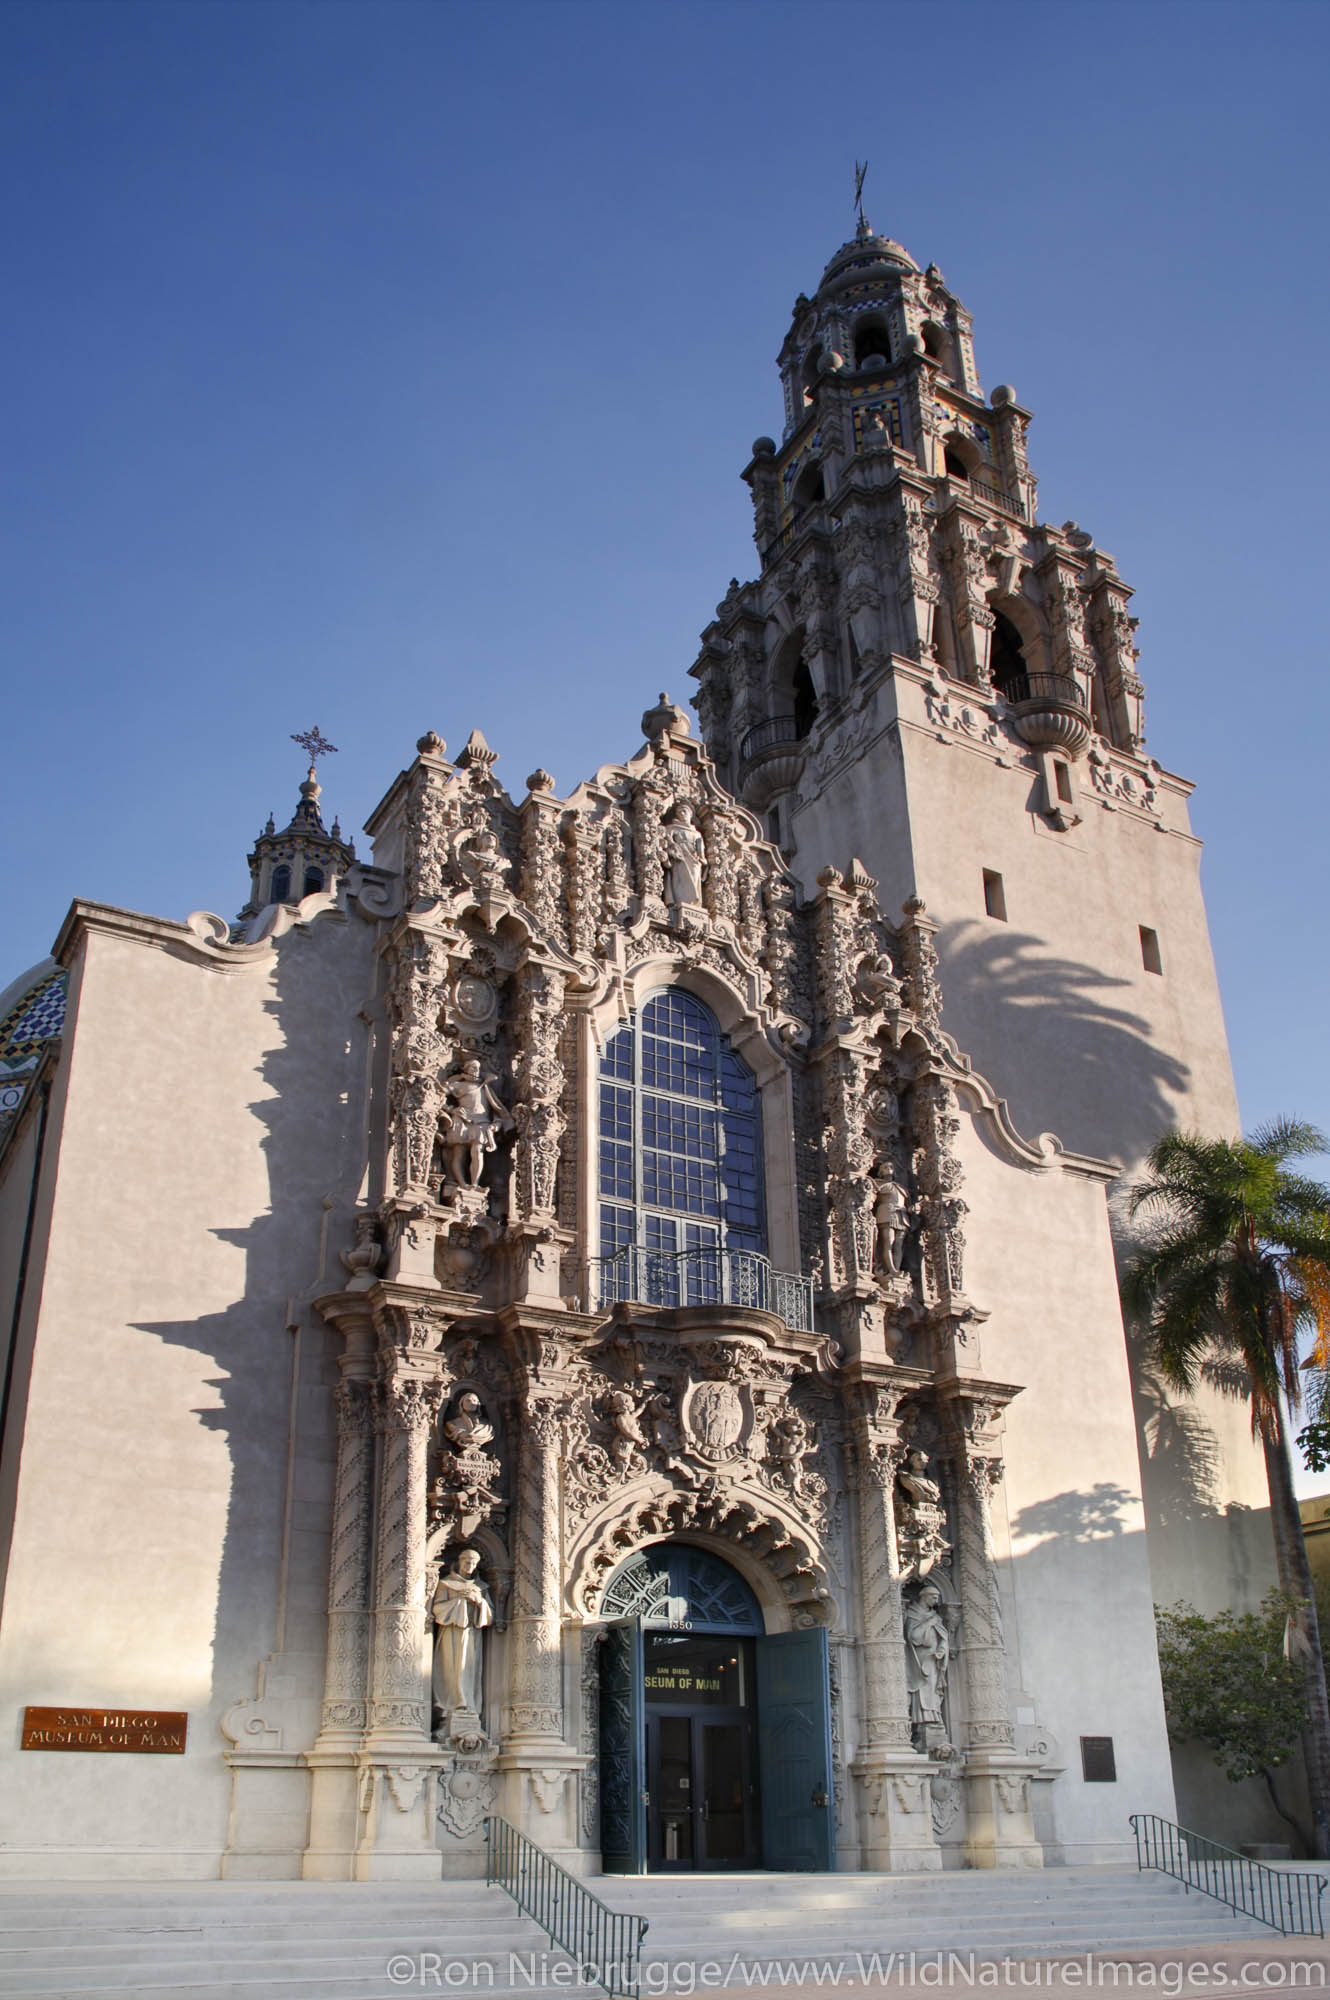 The South Facade of the Museum of Man, Balboa Park, San Diego, California.